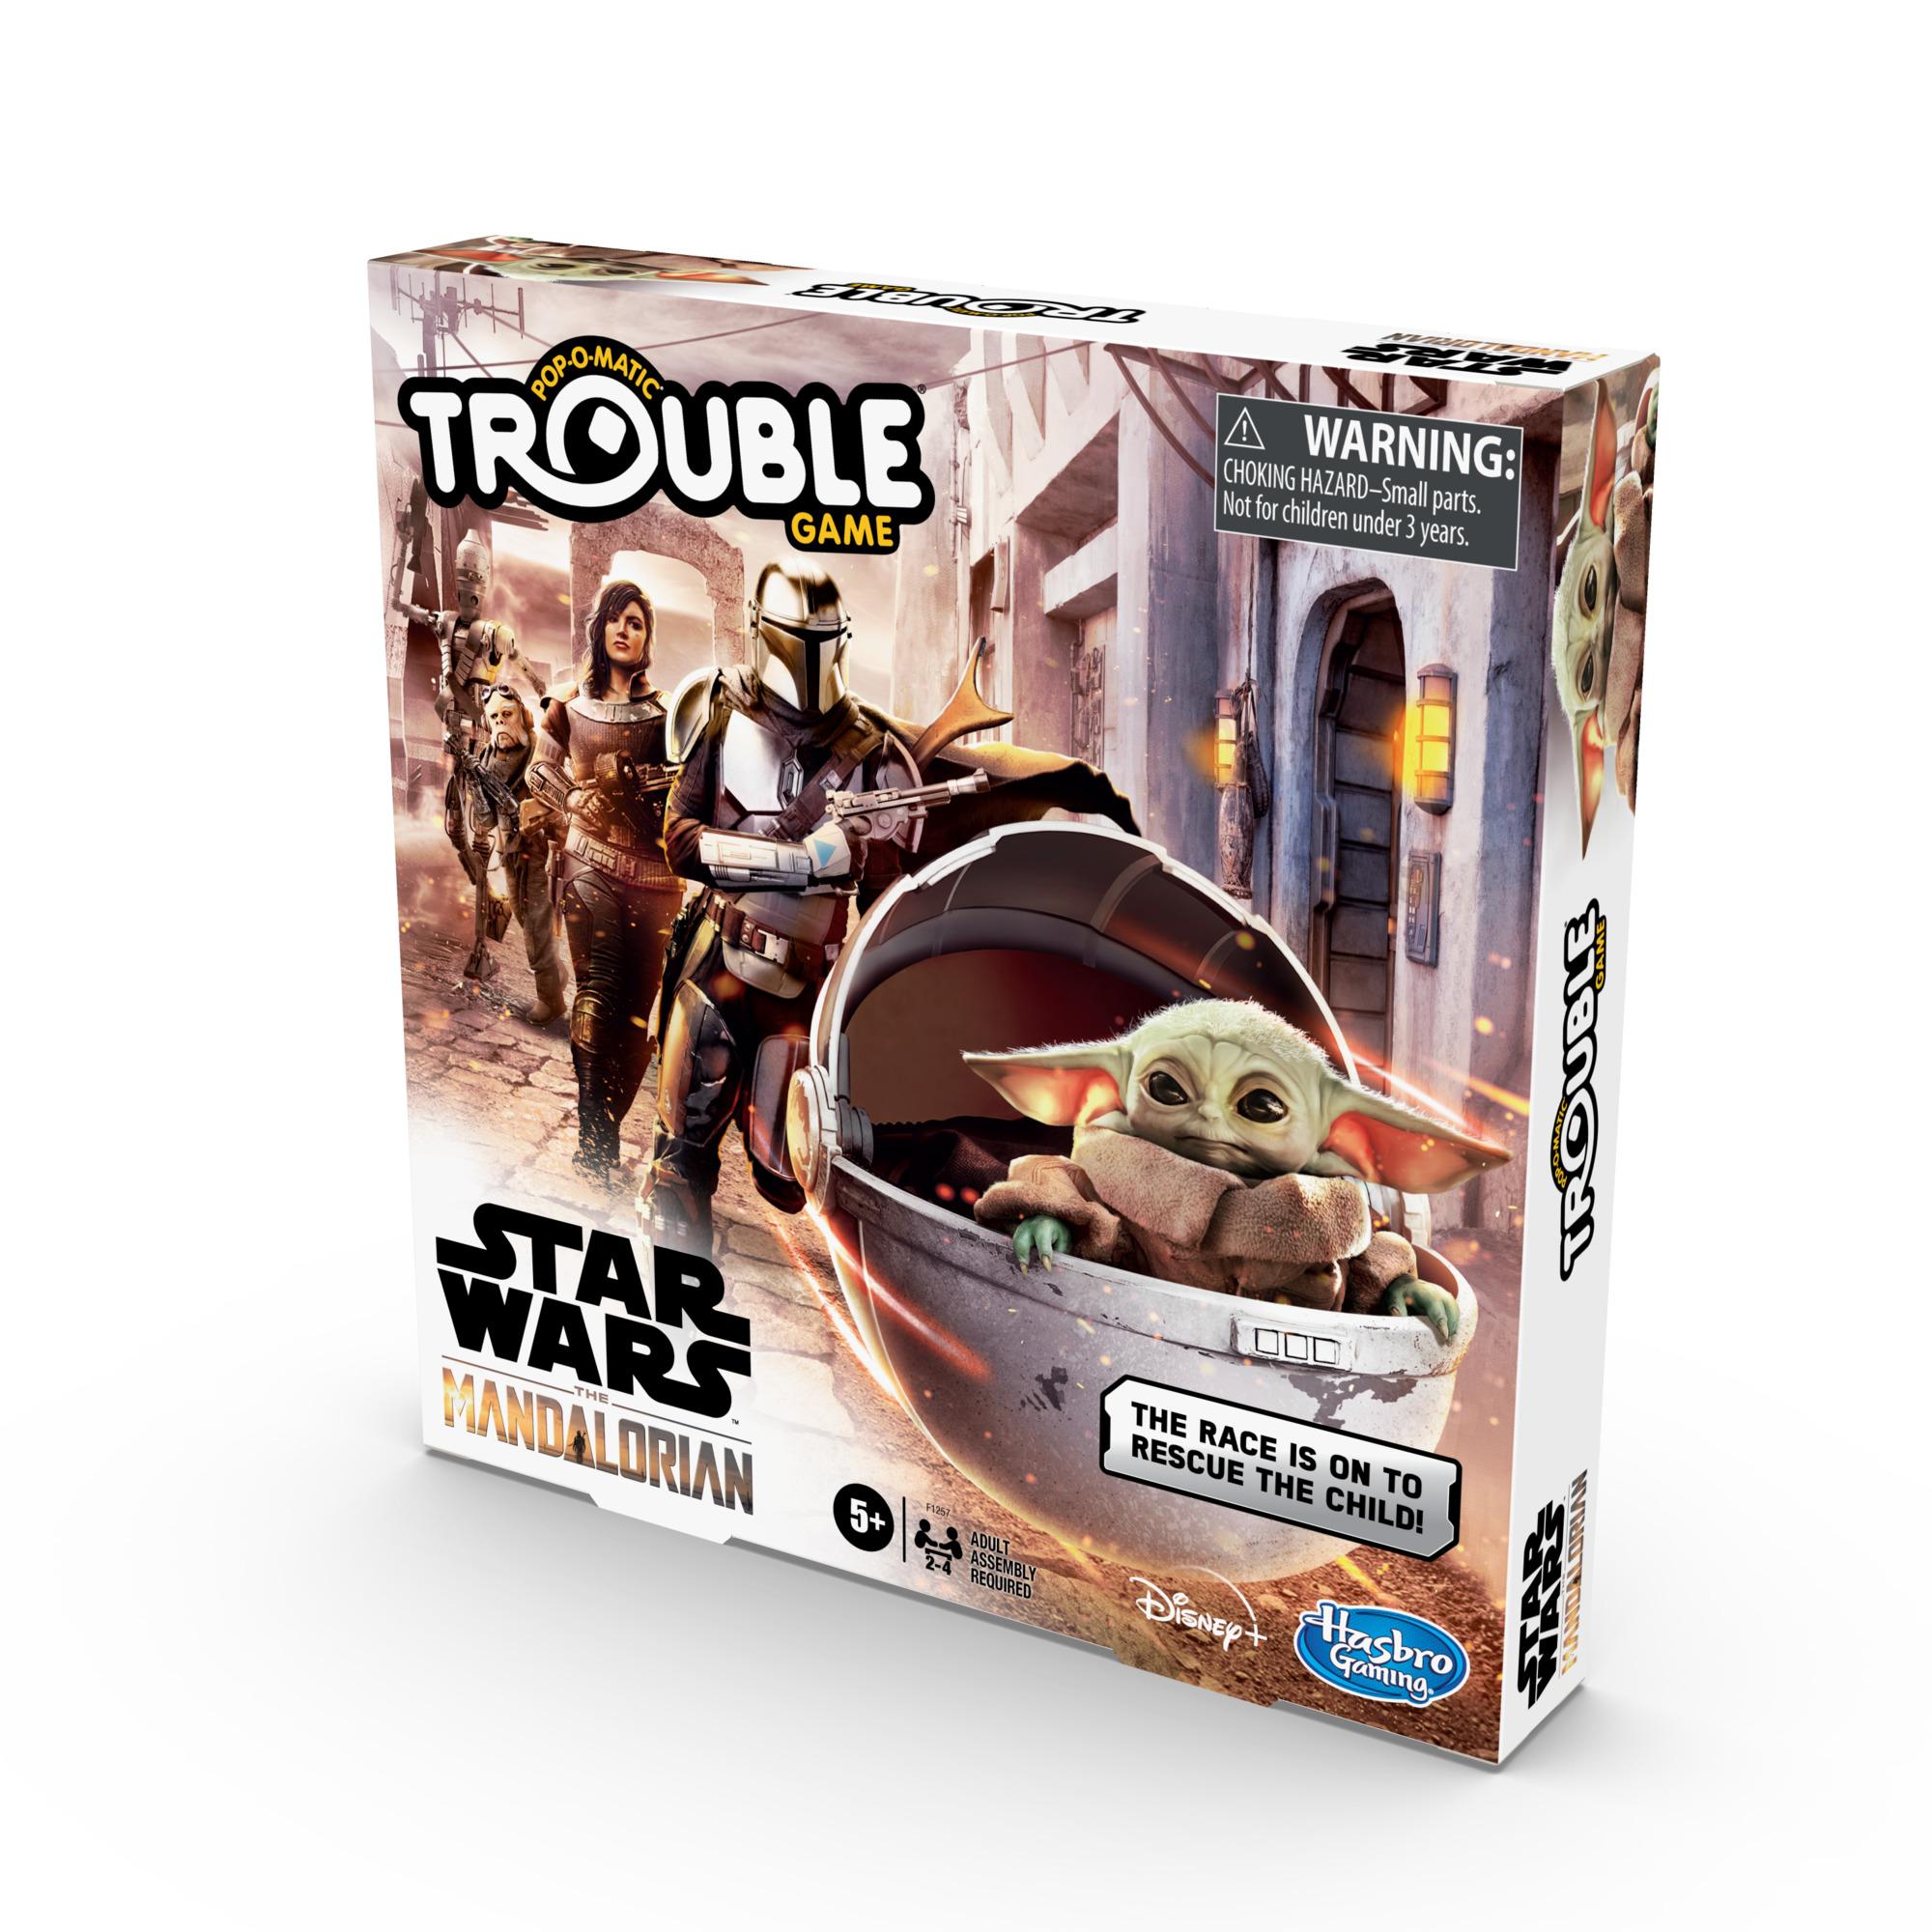 F12570000 Star Wars The Mandalorian Trouble Game pkg 4